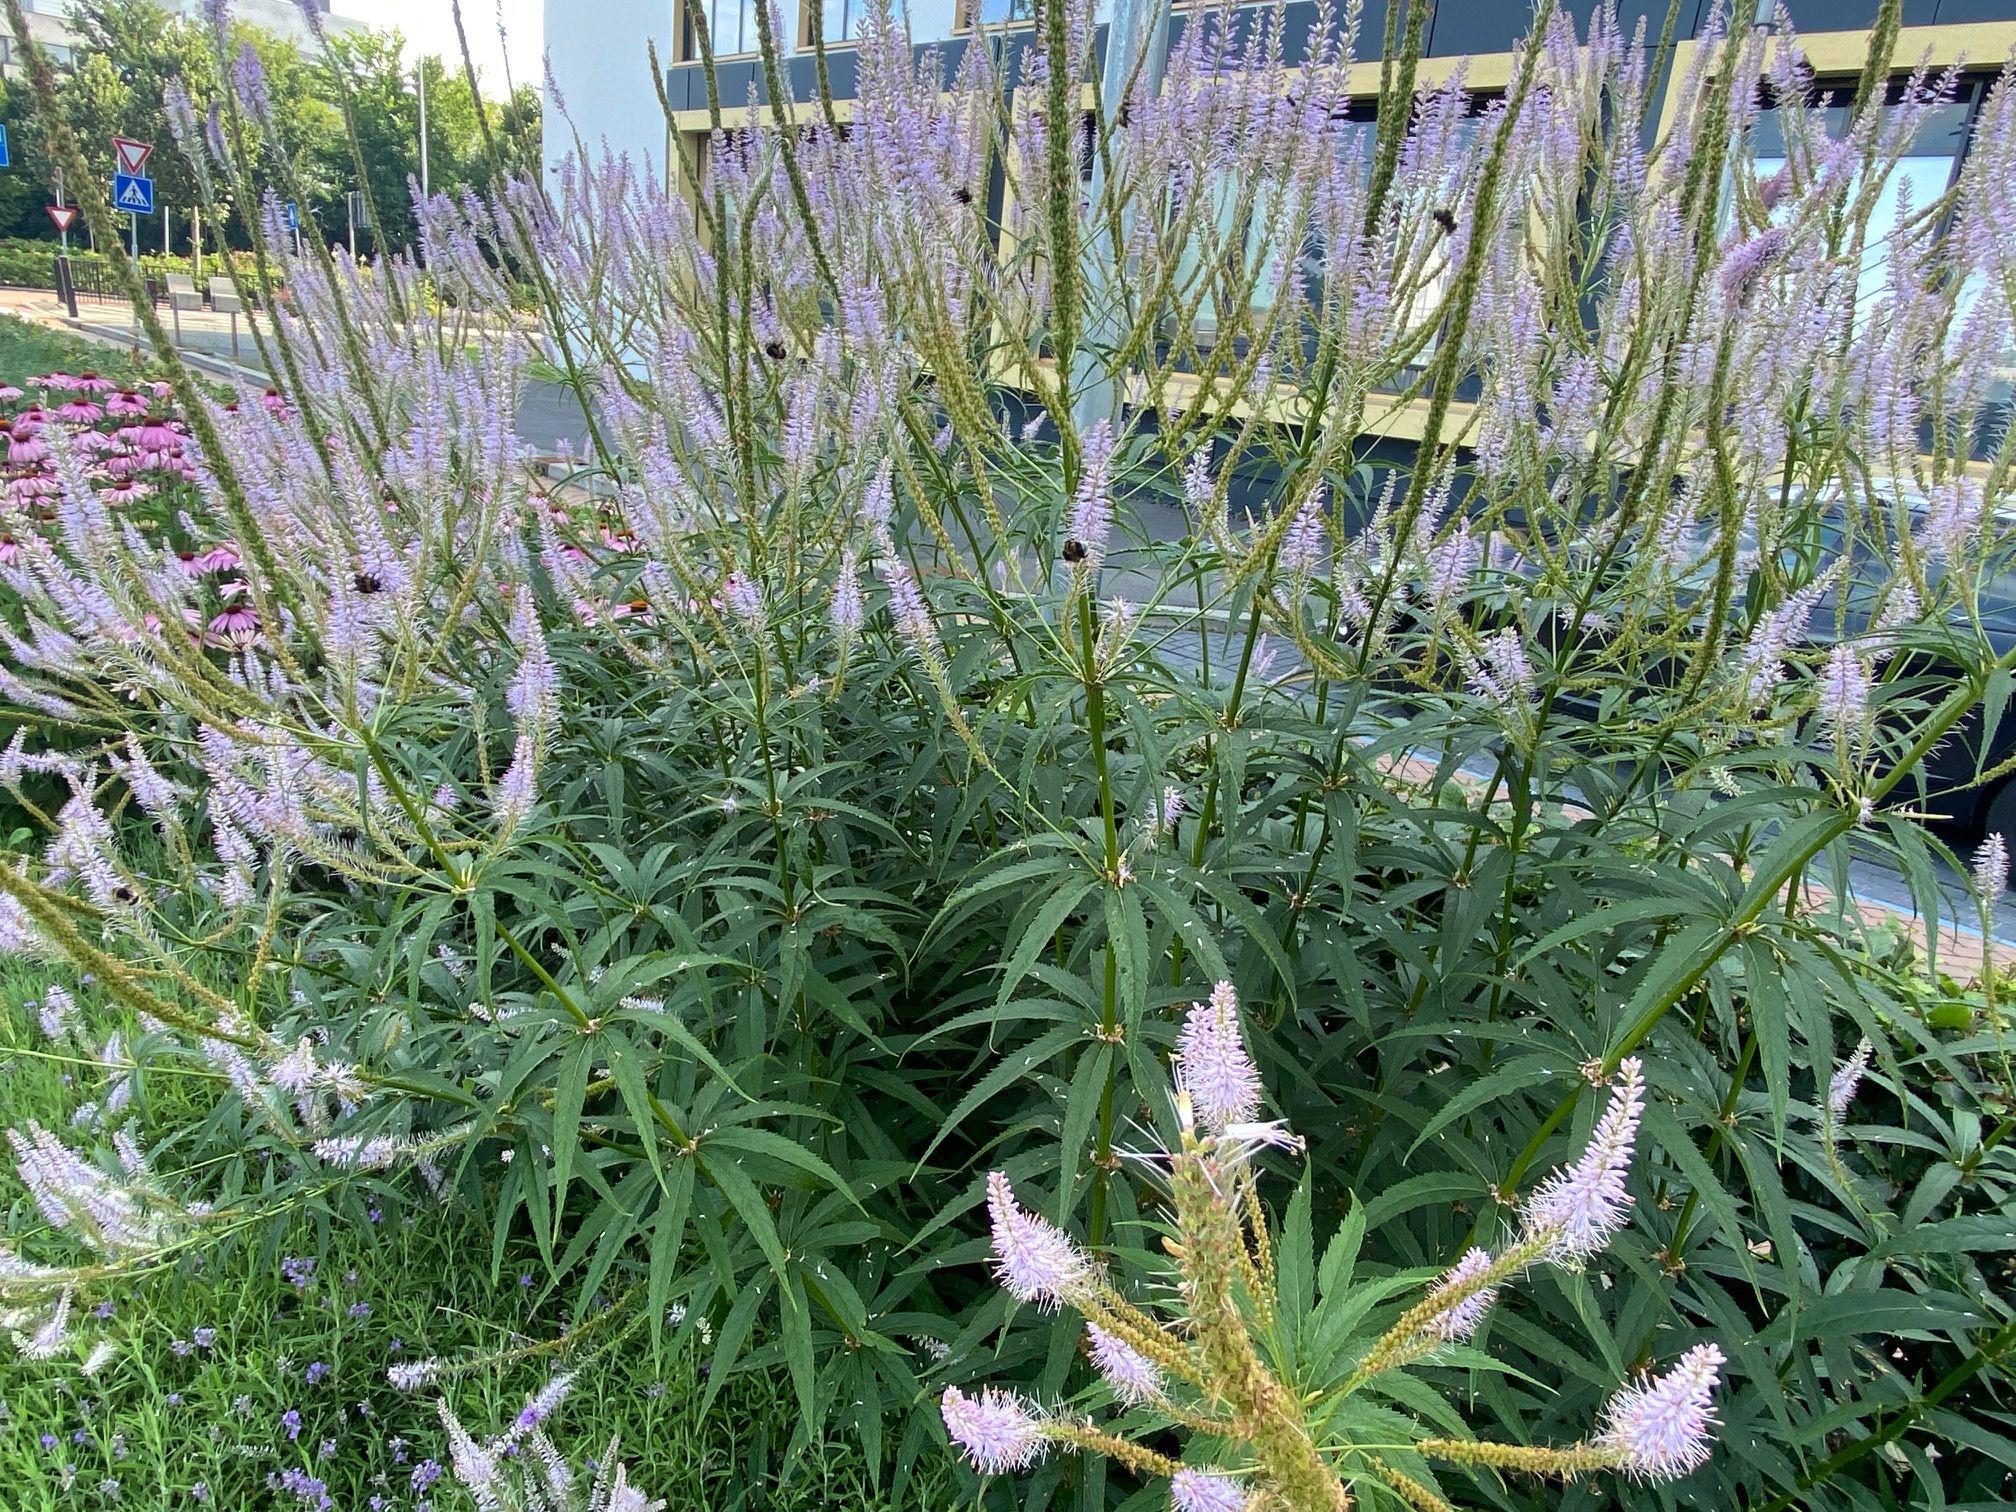 Zwarte ereprijs - Veronicastrum virginicum 'Lavendelturm'